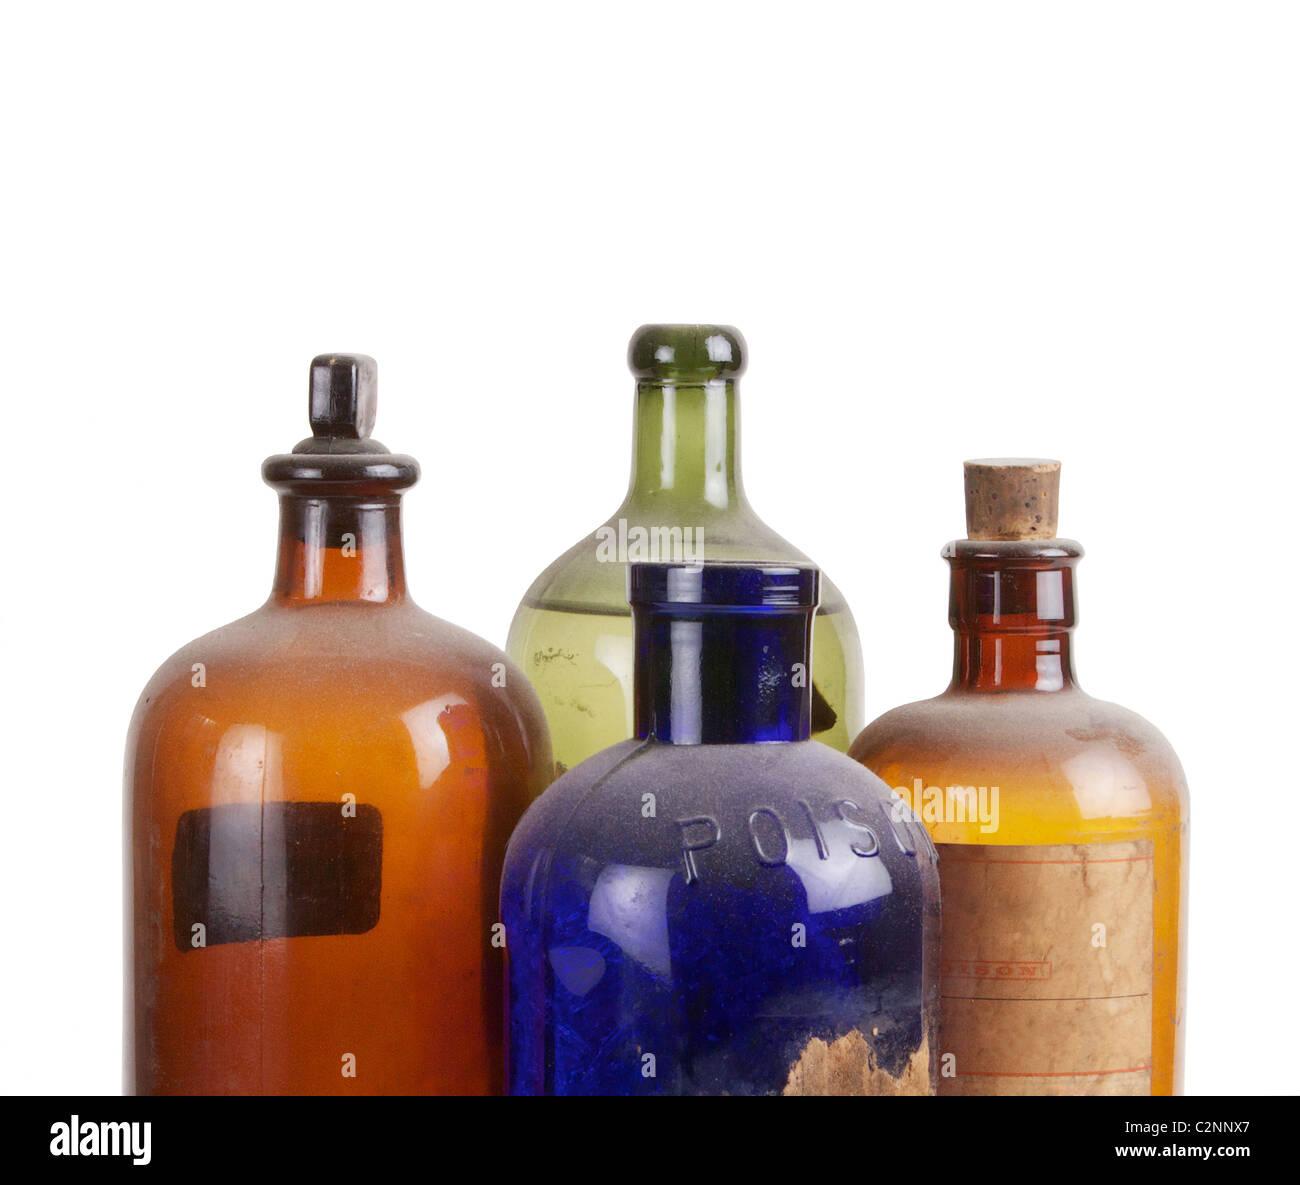 Old Blue Glass Medicine Bottles, Green Glass Glass Medicine Bottles, and Brown Glass Medicine Bottles, on white background Stock Photo